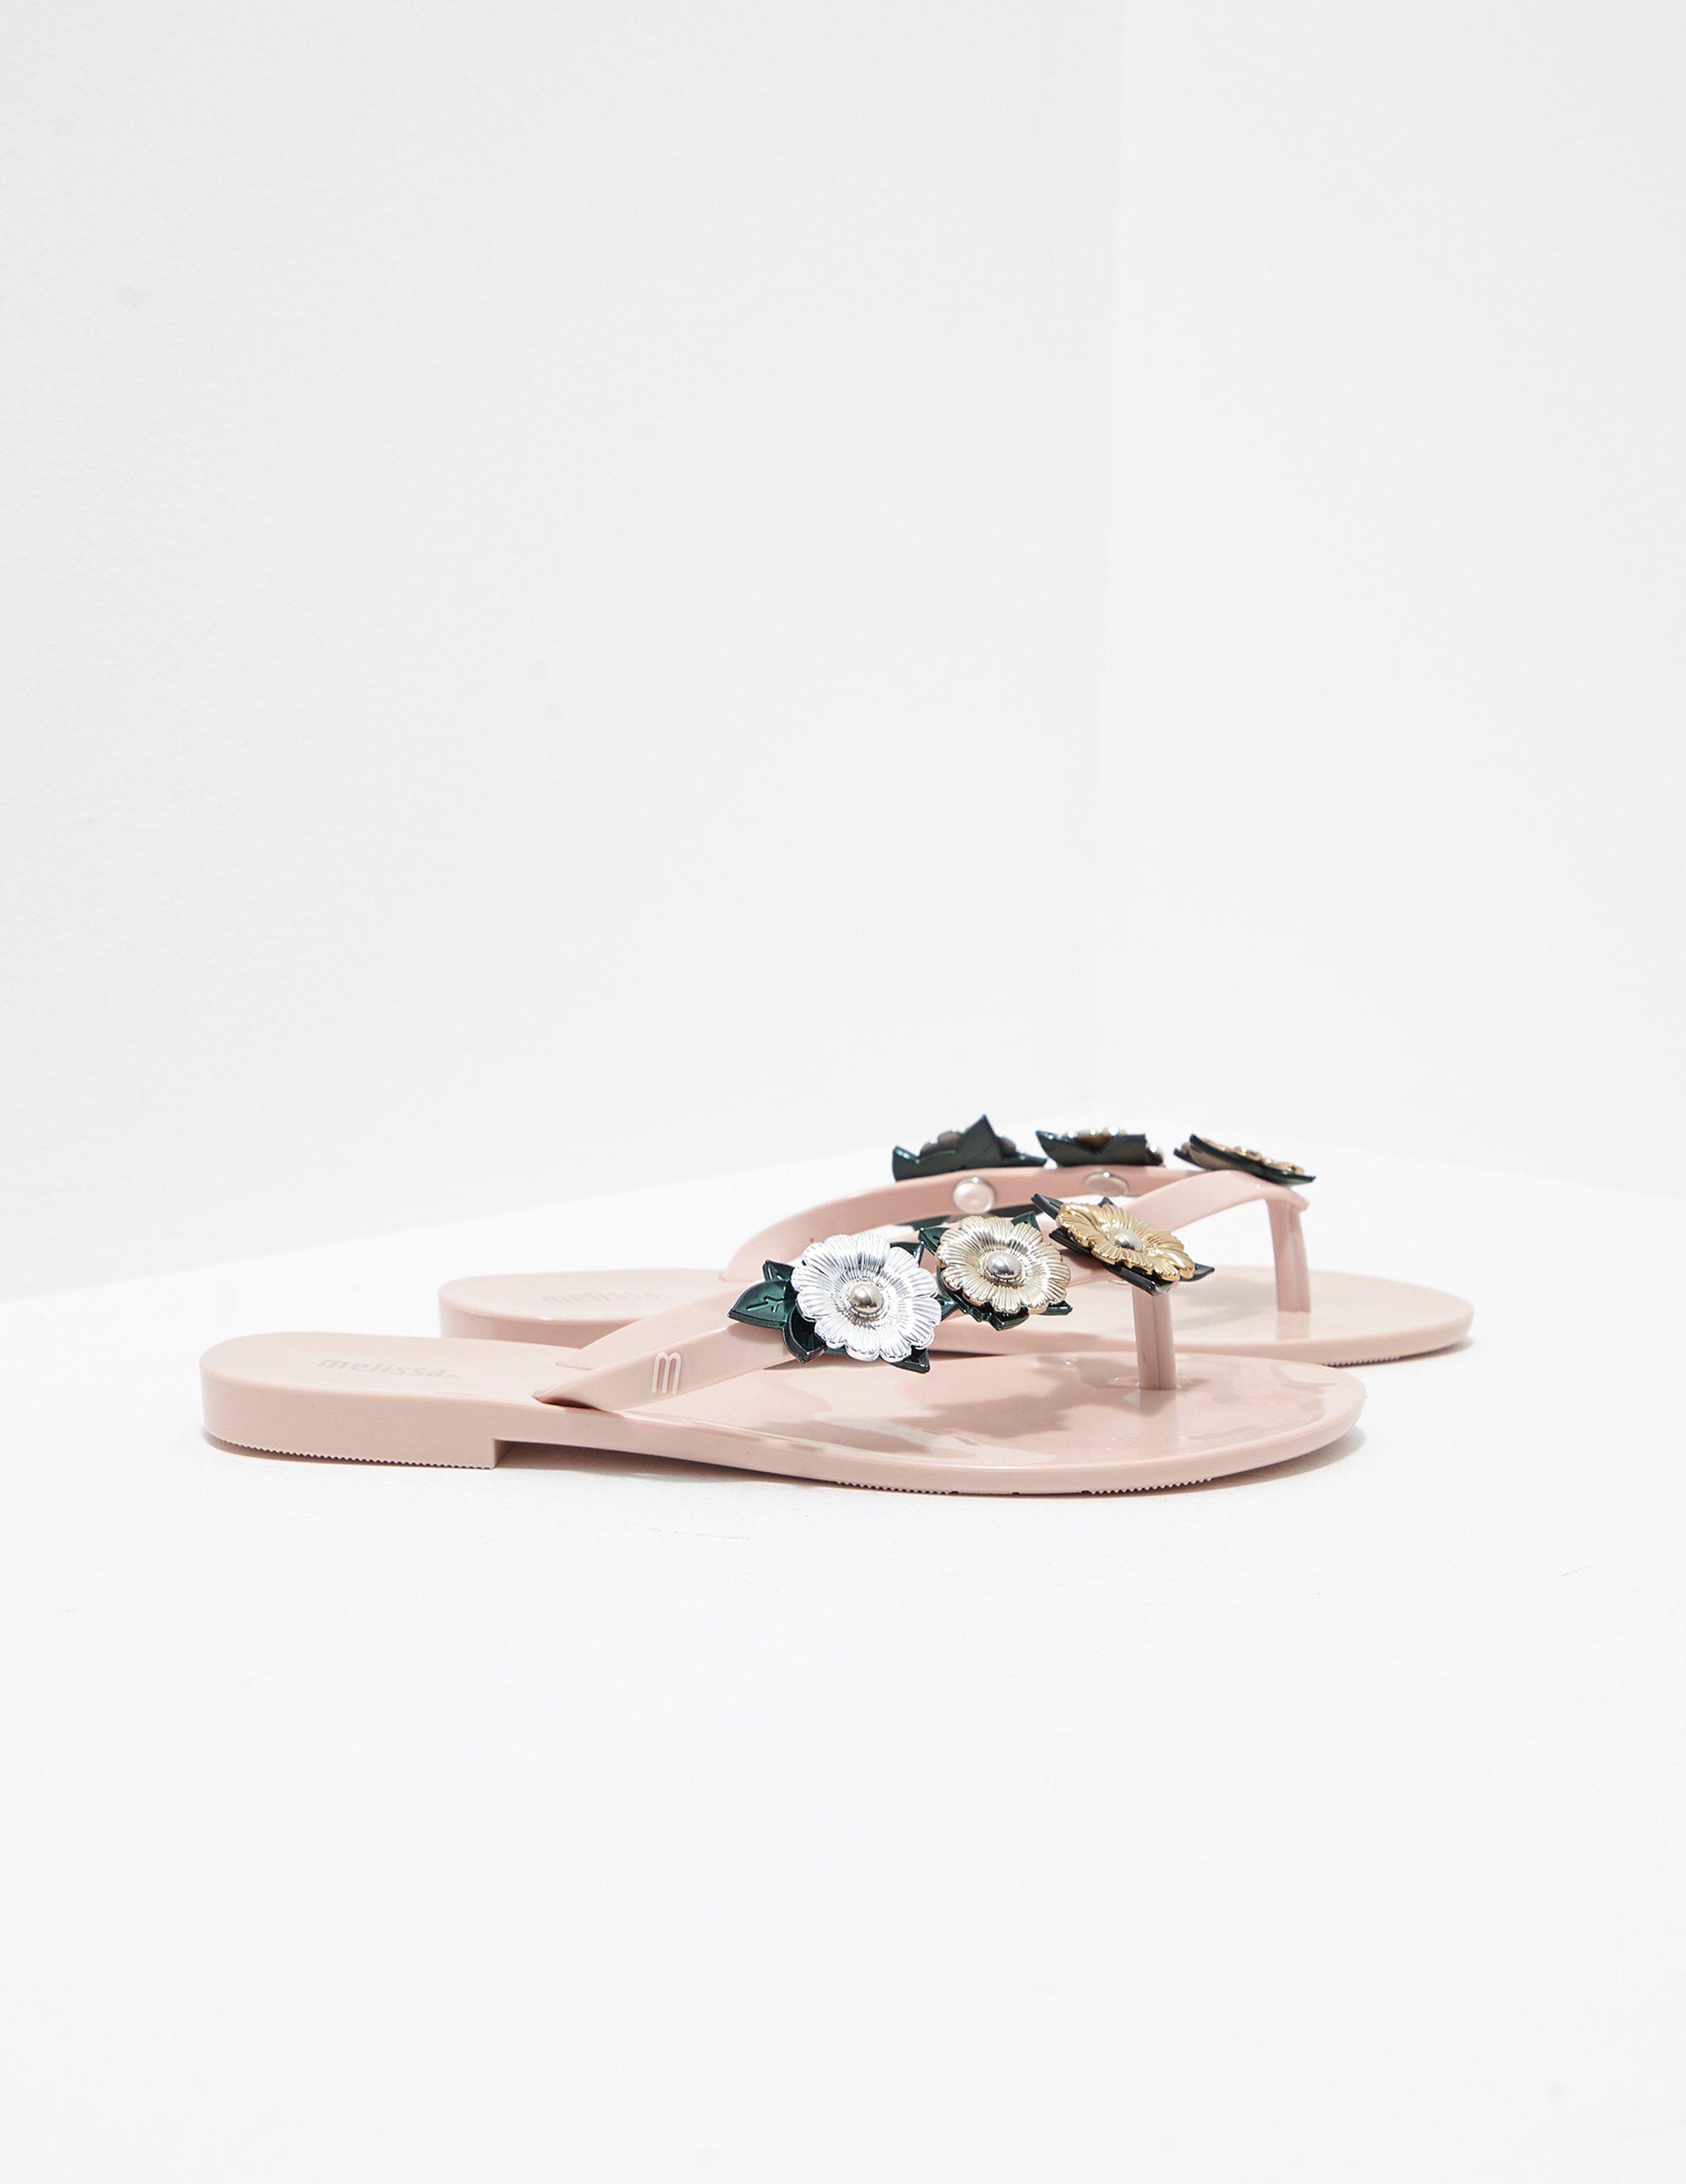 Melissa Harmonic Flip Flops